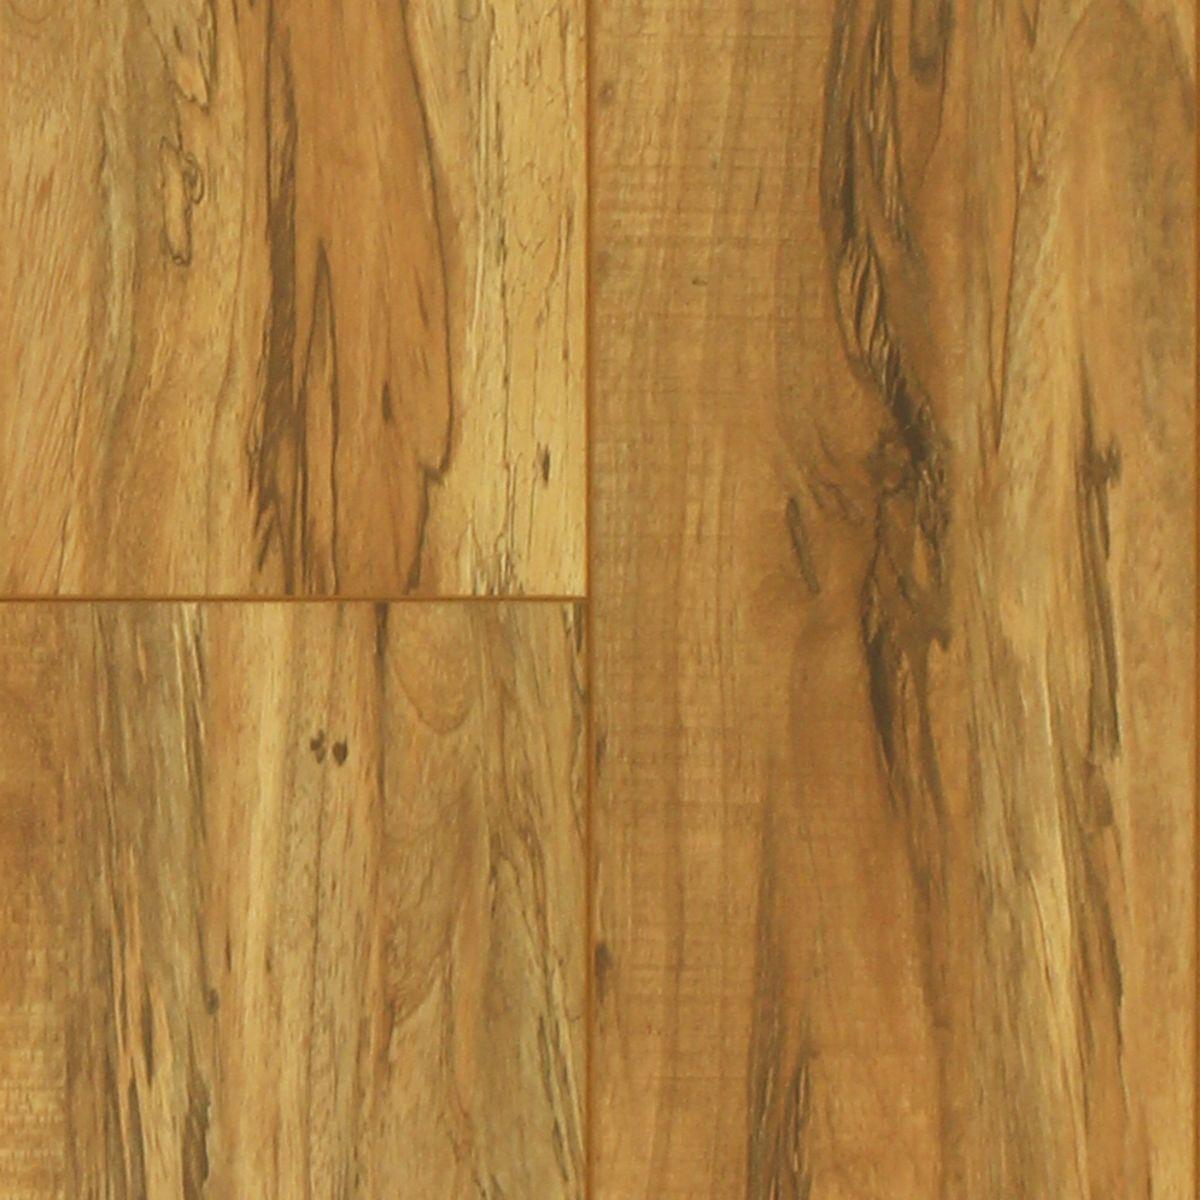 Laminate Flooring Lifetime Traffic, Pioneer Xl Laminate Flooring